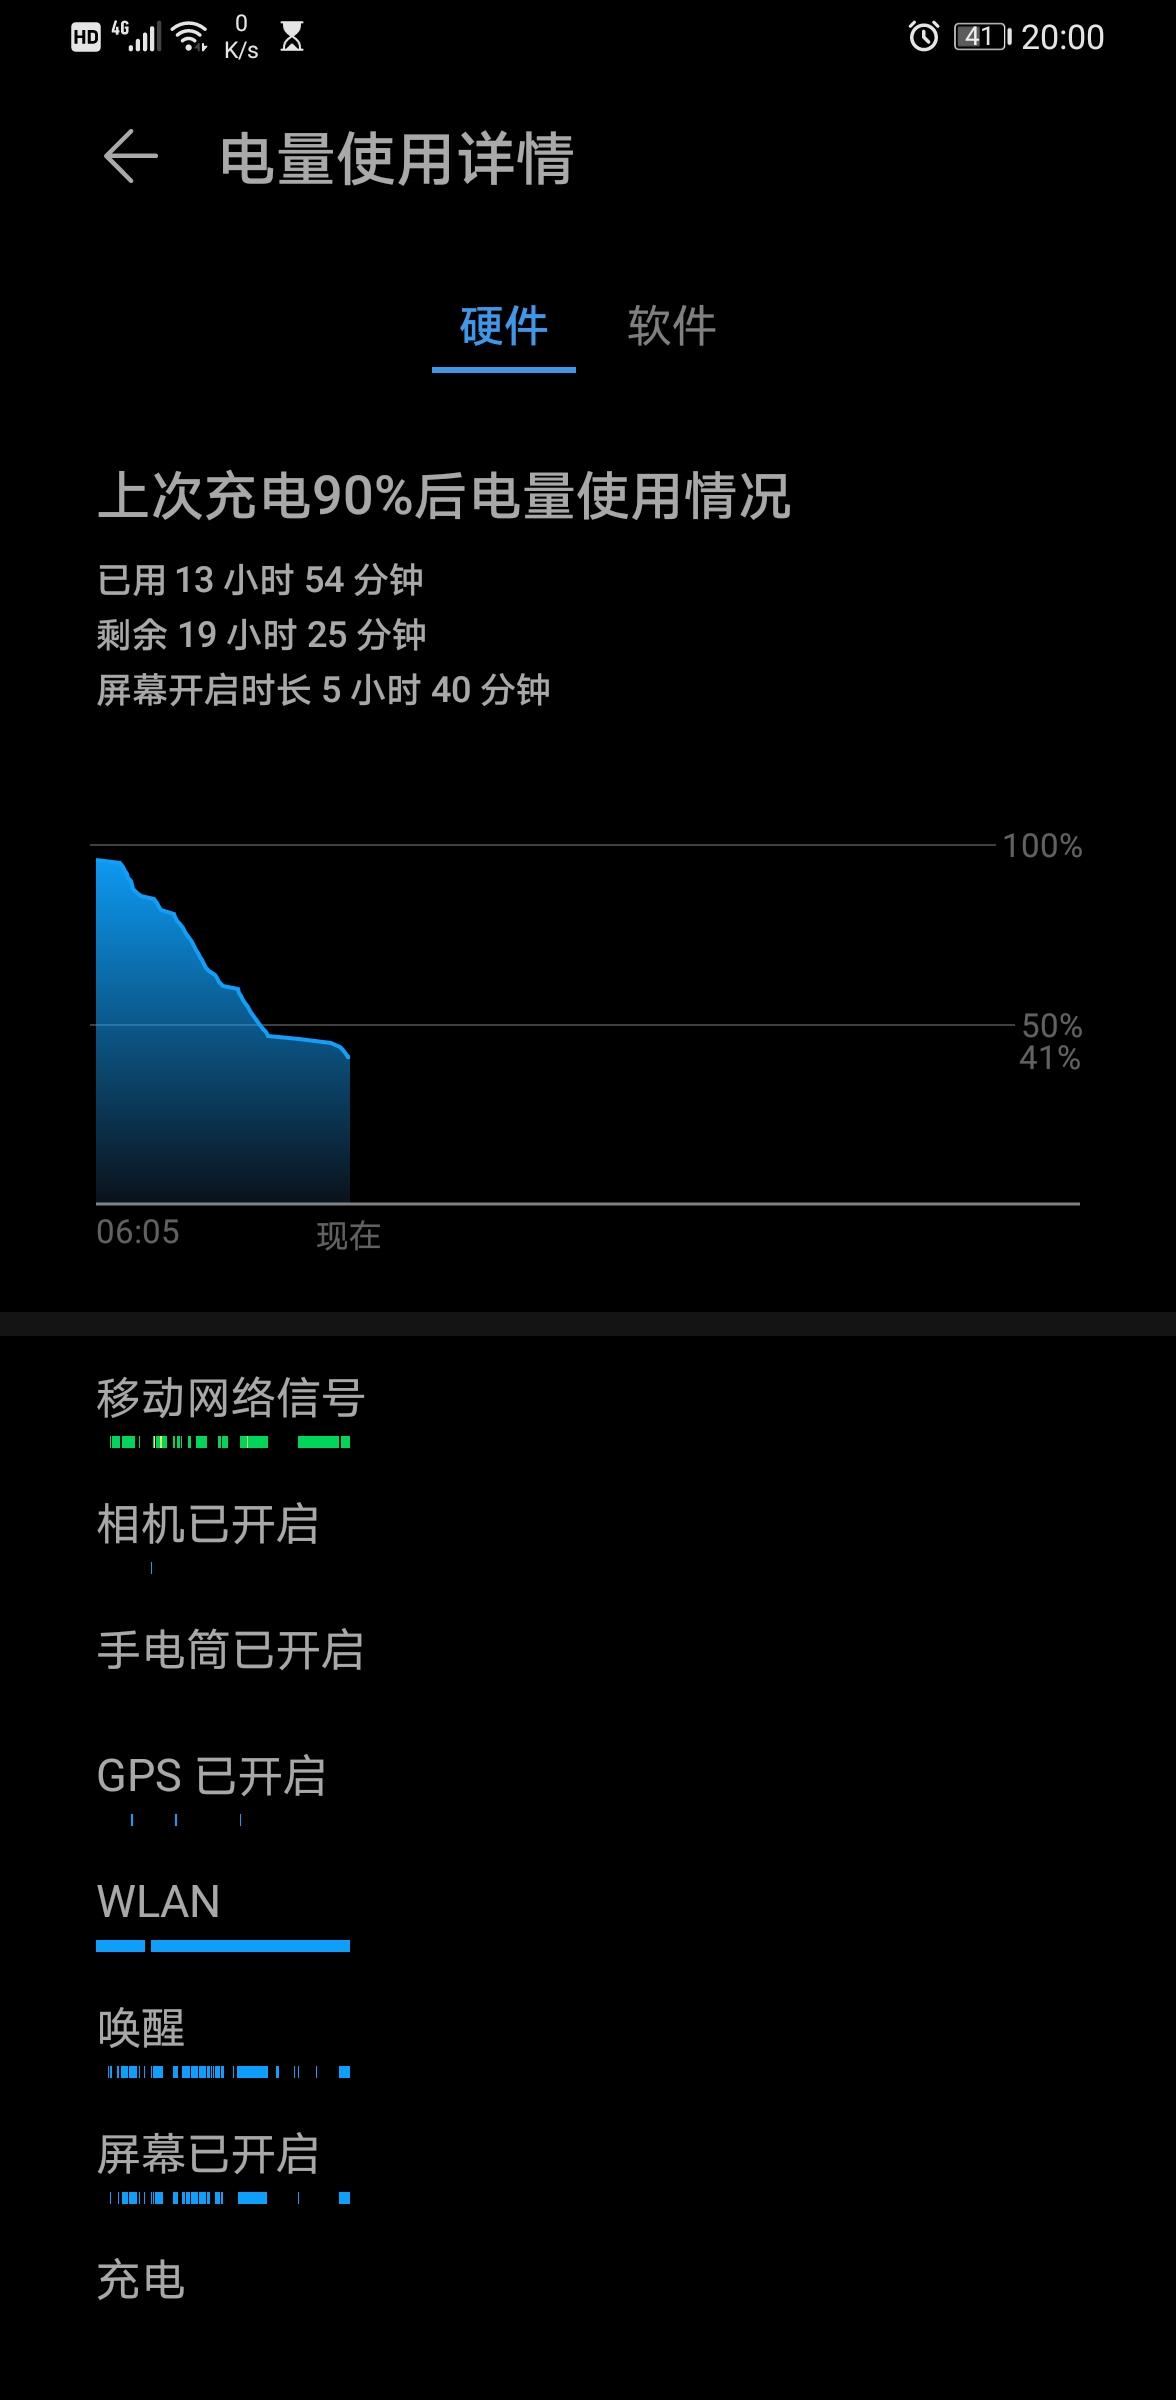 Screenshot_20200512_200001_com.huawei.systemmanager.jpg